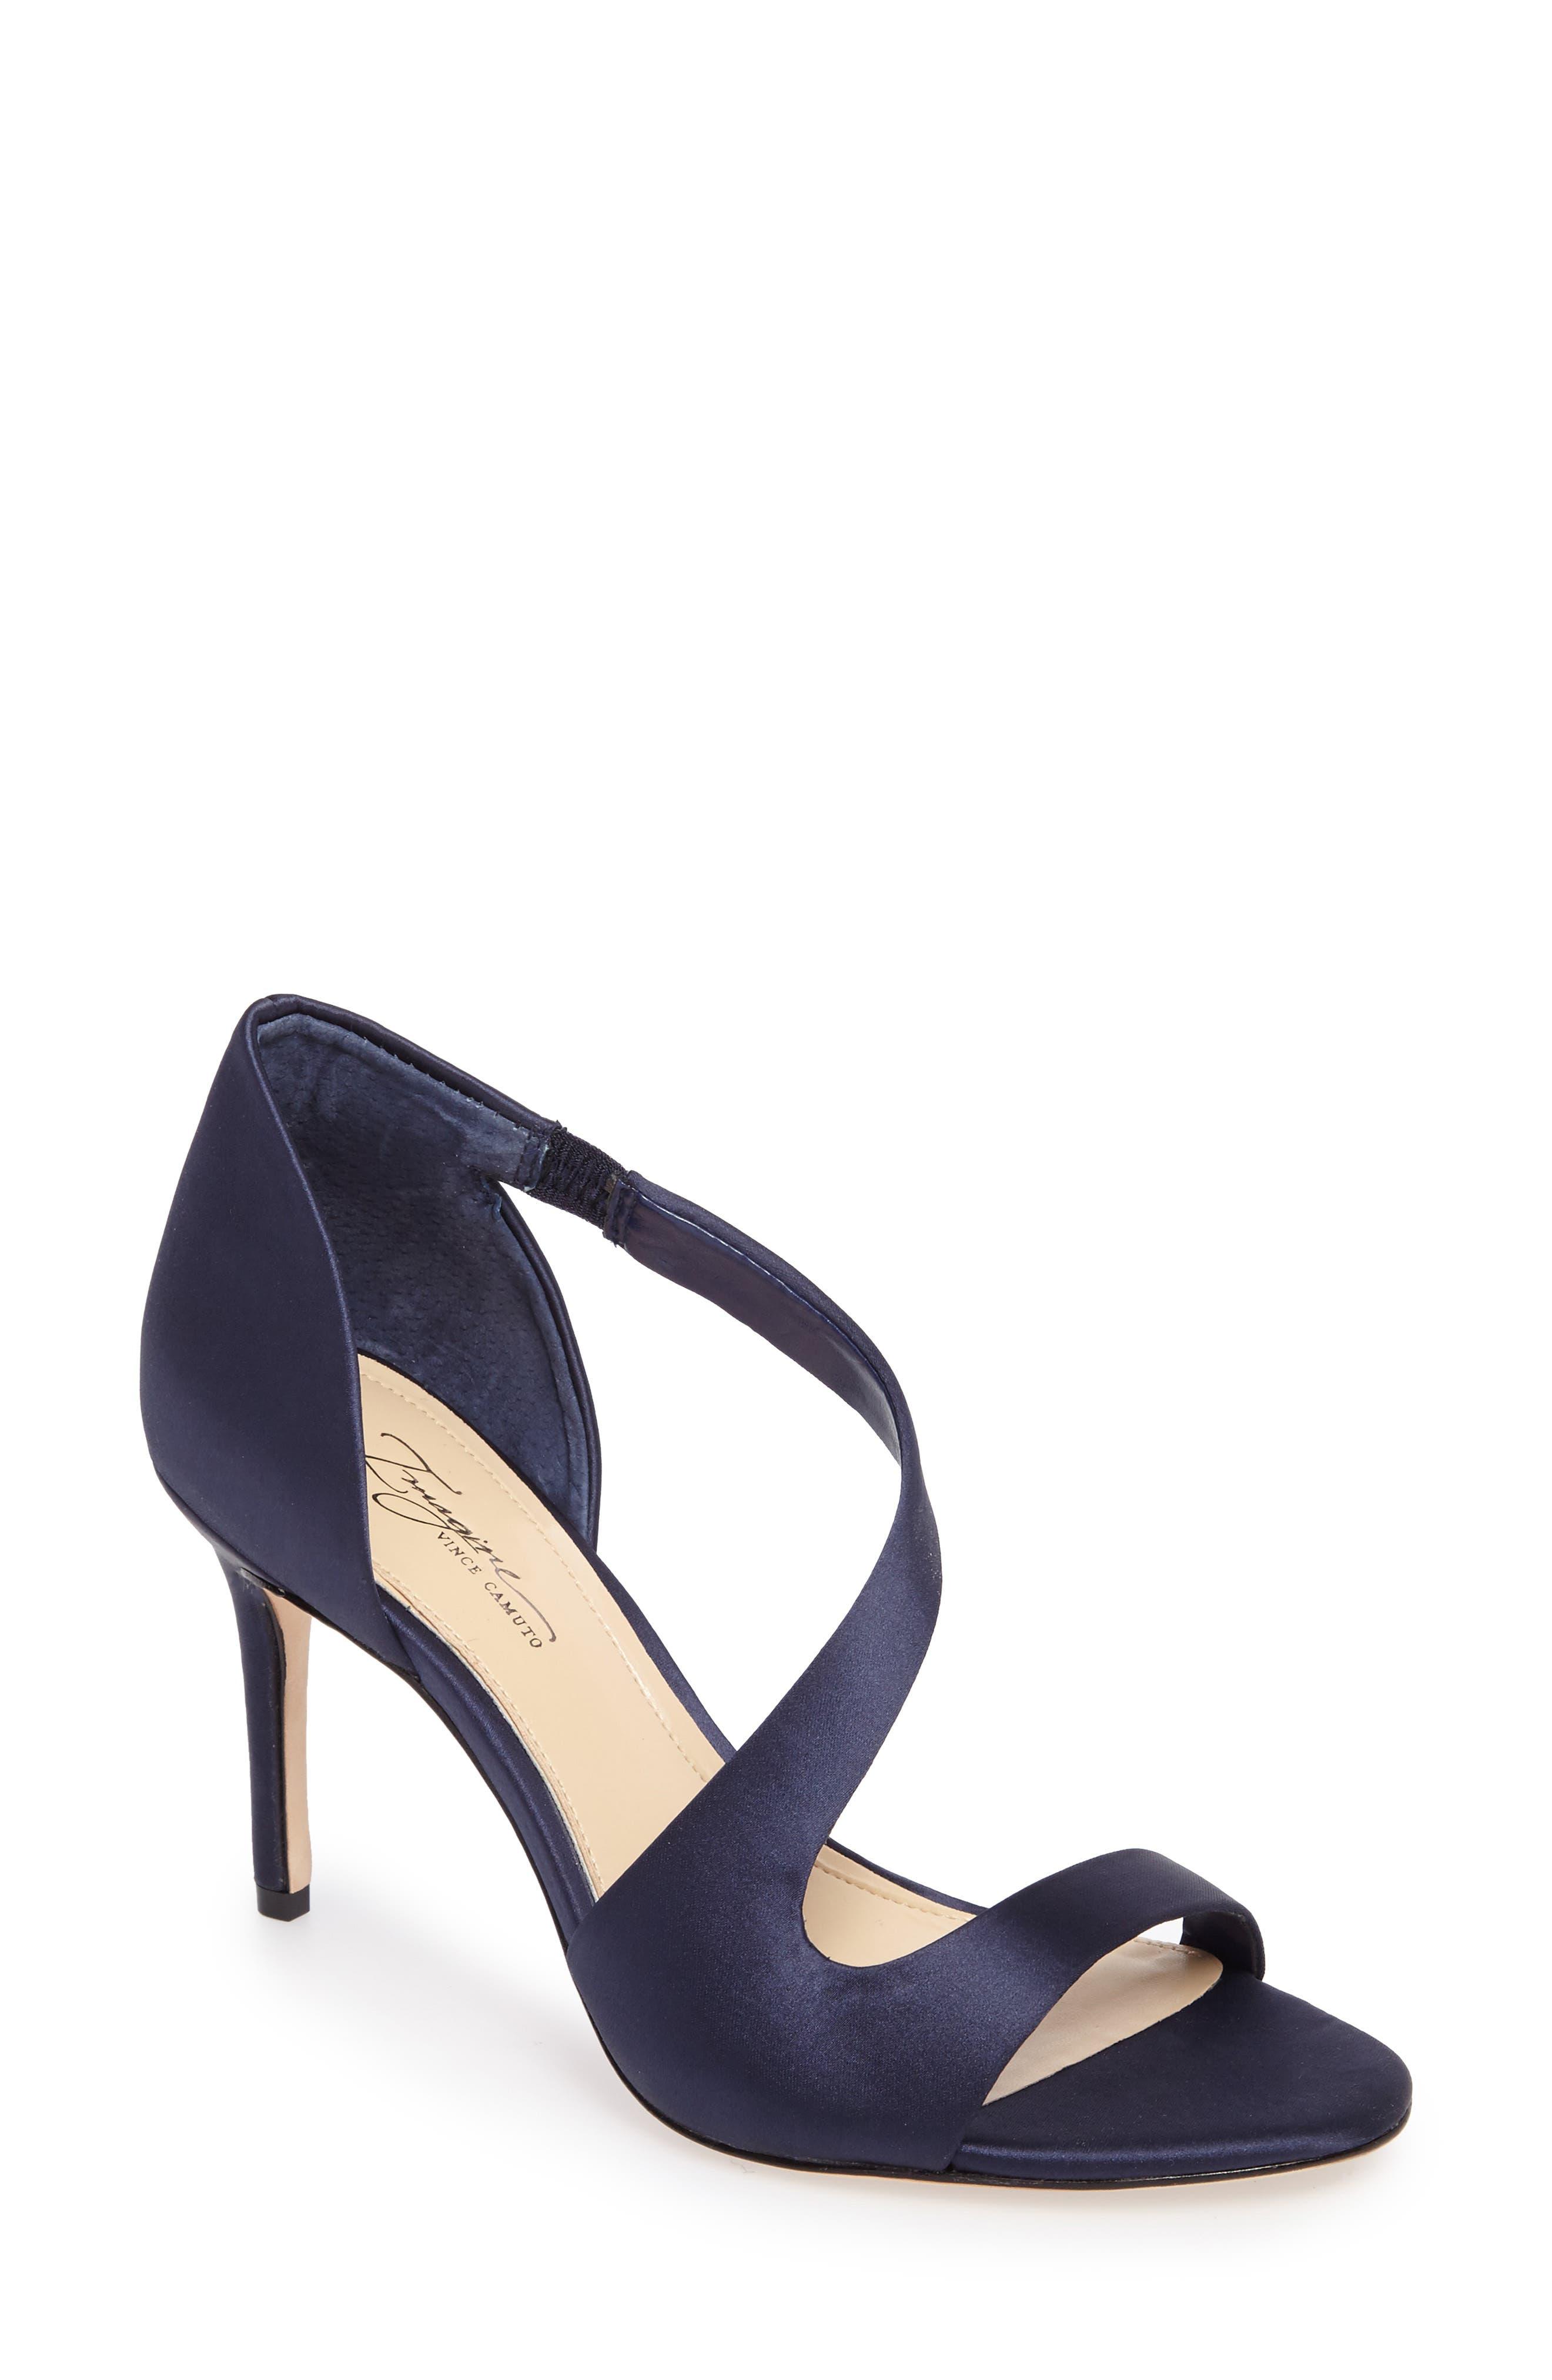 Imagine Vince Camuto Purch Sandal (Women)